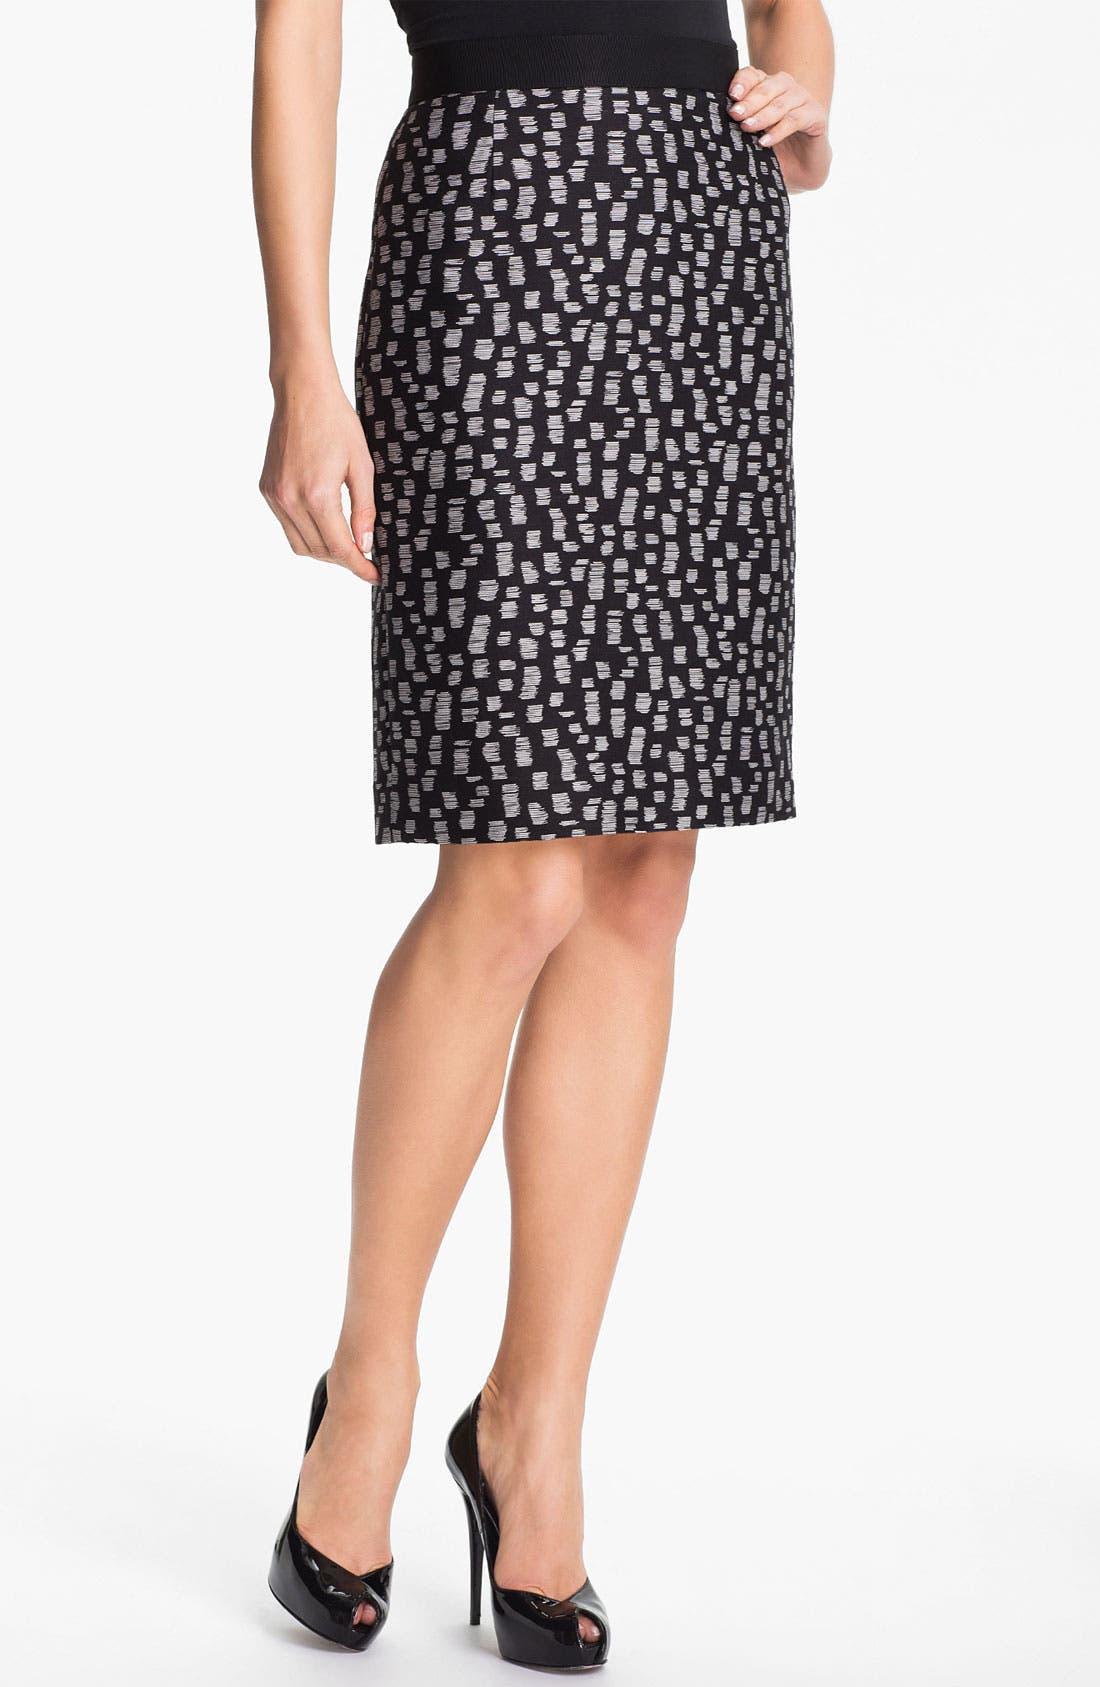 Alternate Image 1 Selected - Classiques Entier® 'Campania' Jacquard Skirt